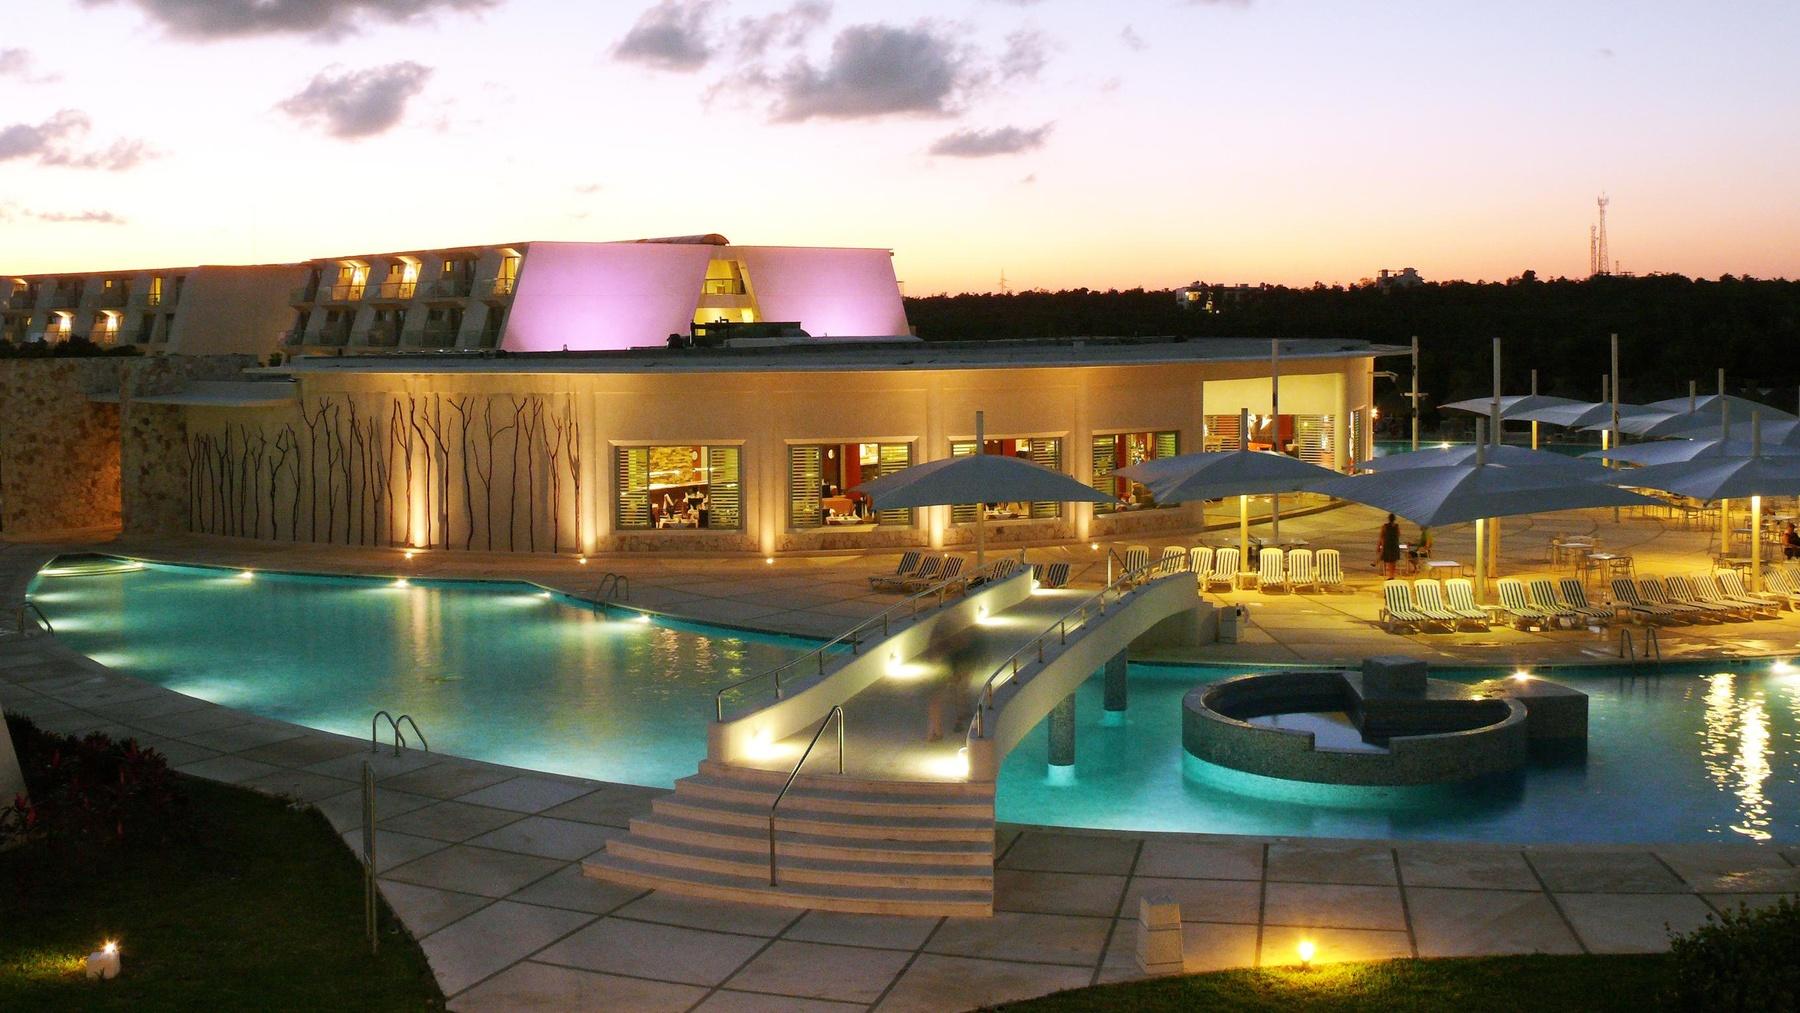 The large resort